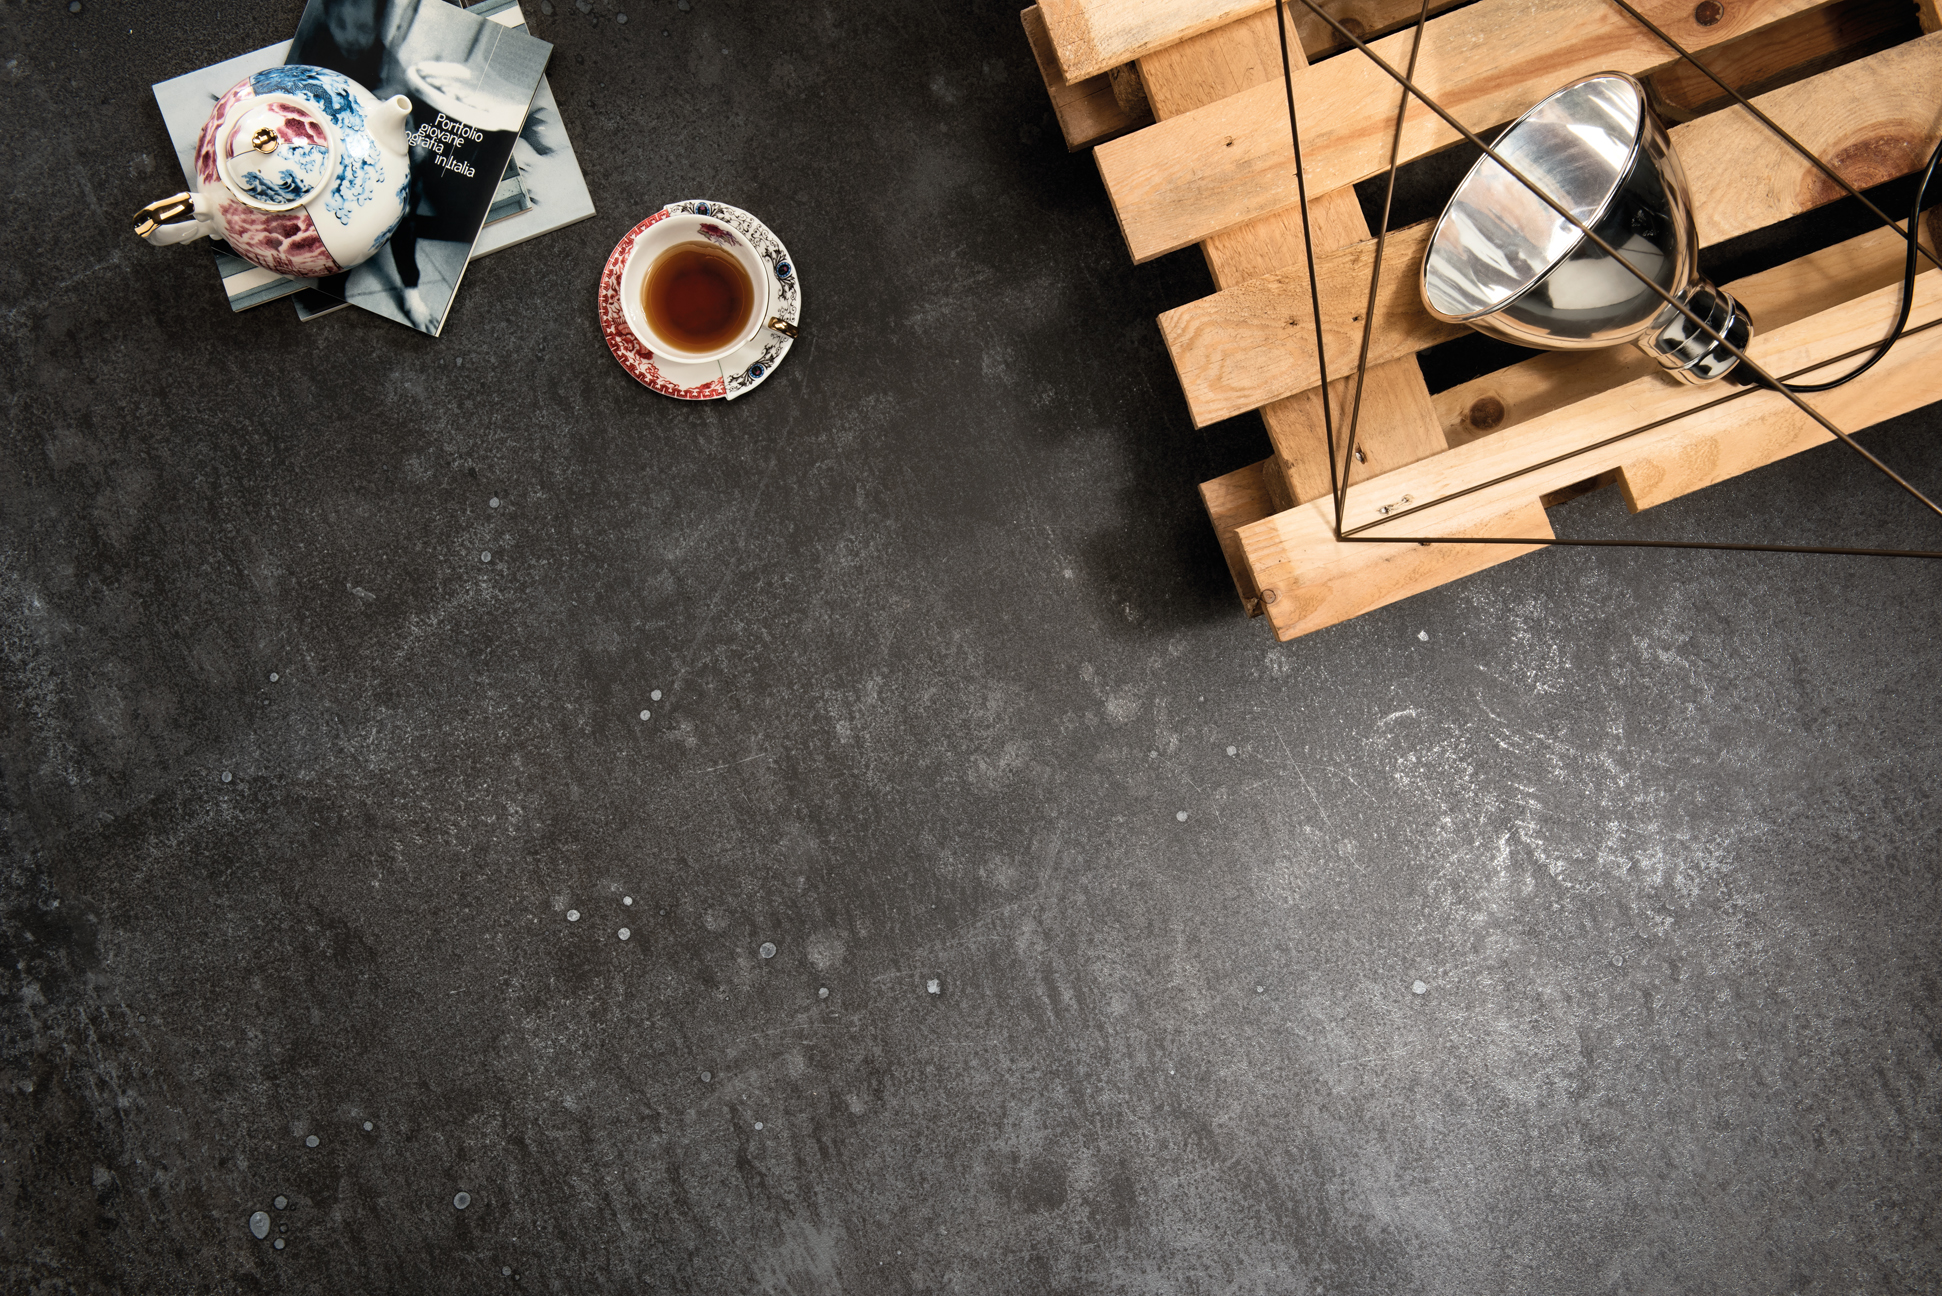 porcelain tile images: Fusione range high quality photo